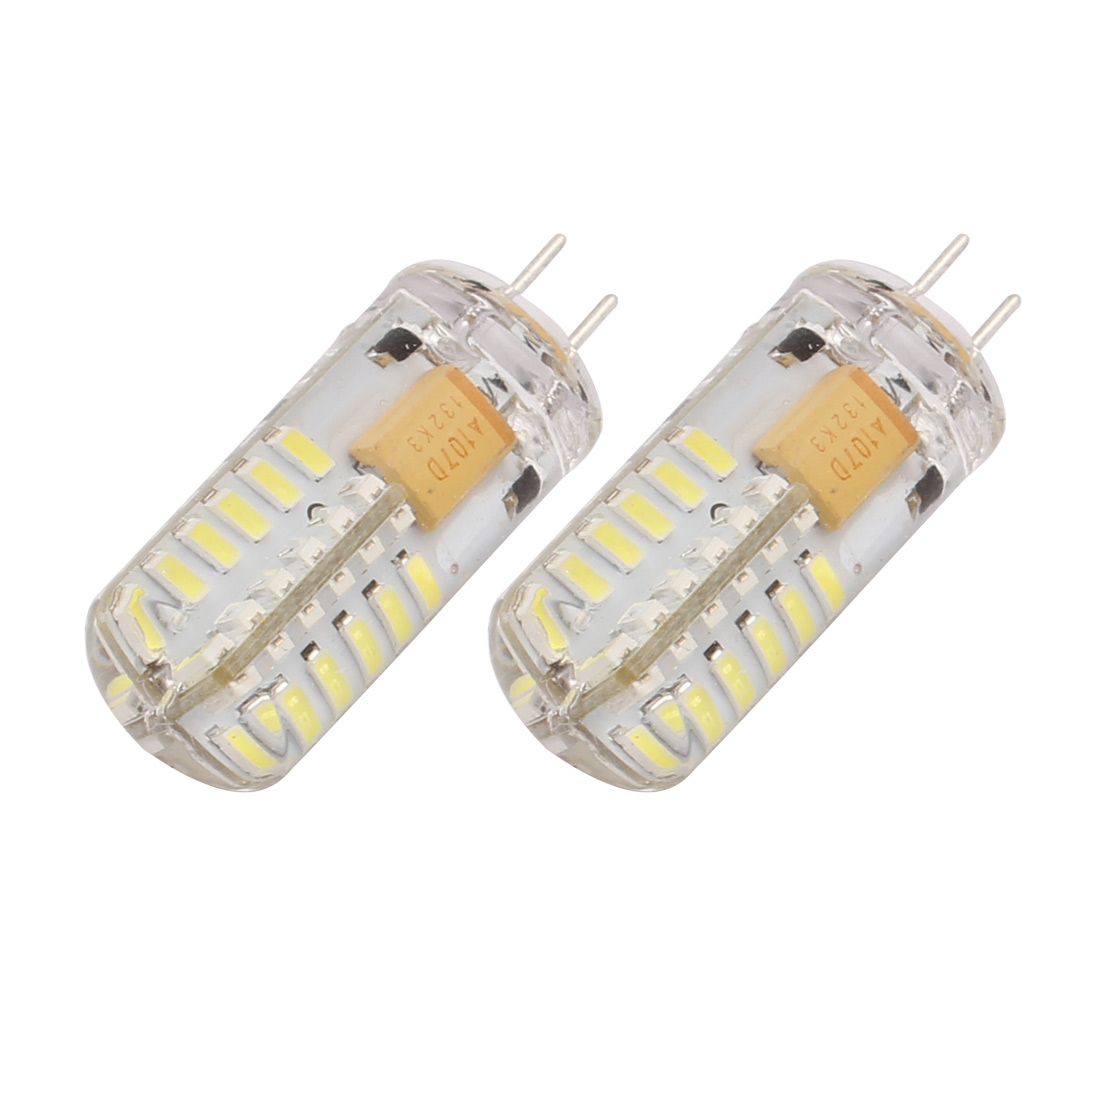 2Pcs AC/DC 12V 3W G4 3014SMD LED Corn Light Bulb 48-LED Silicone Neutral White